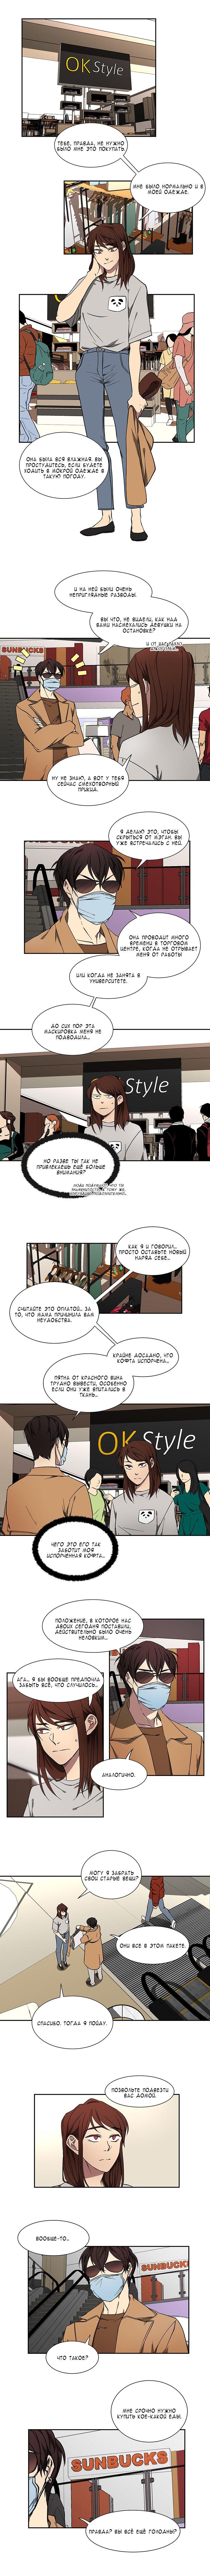 Манга Я люблю Ю / I love Yoo  - Том 1 Глава 41 Страница 7